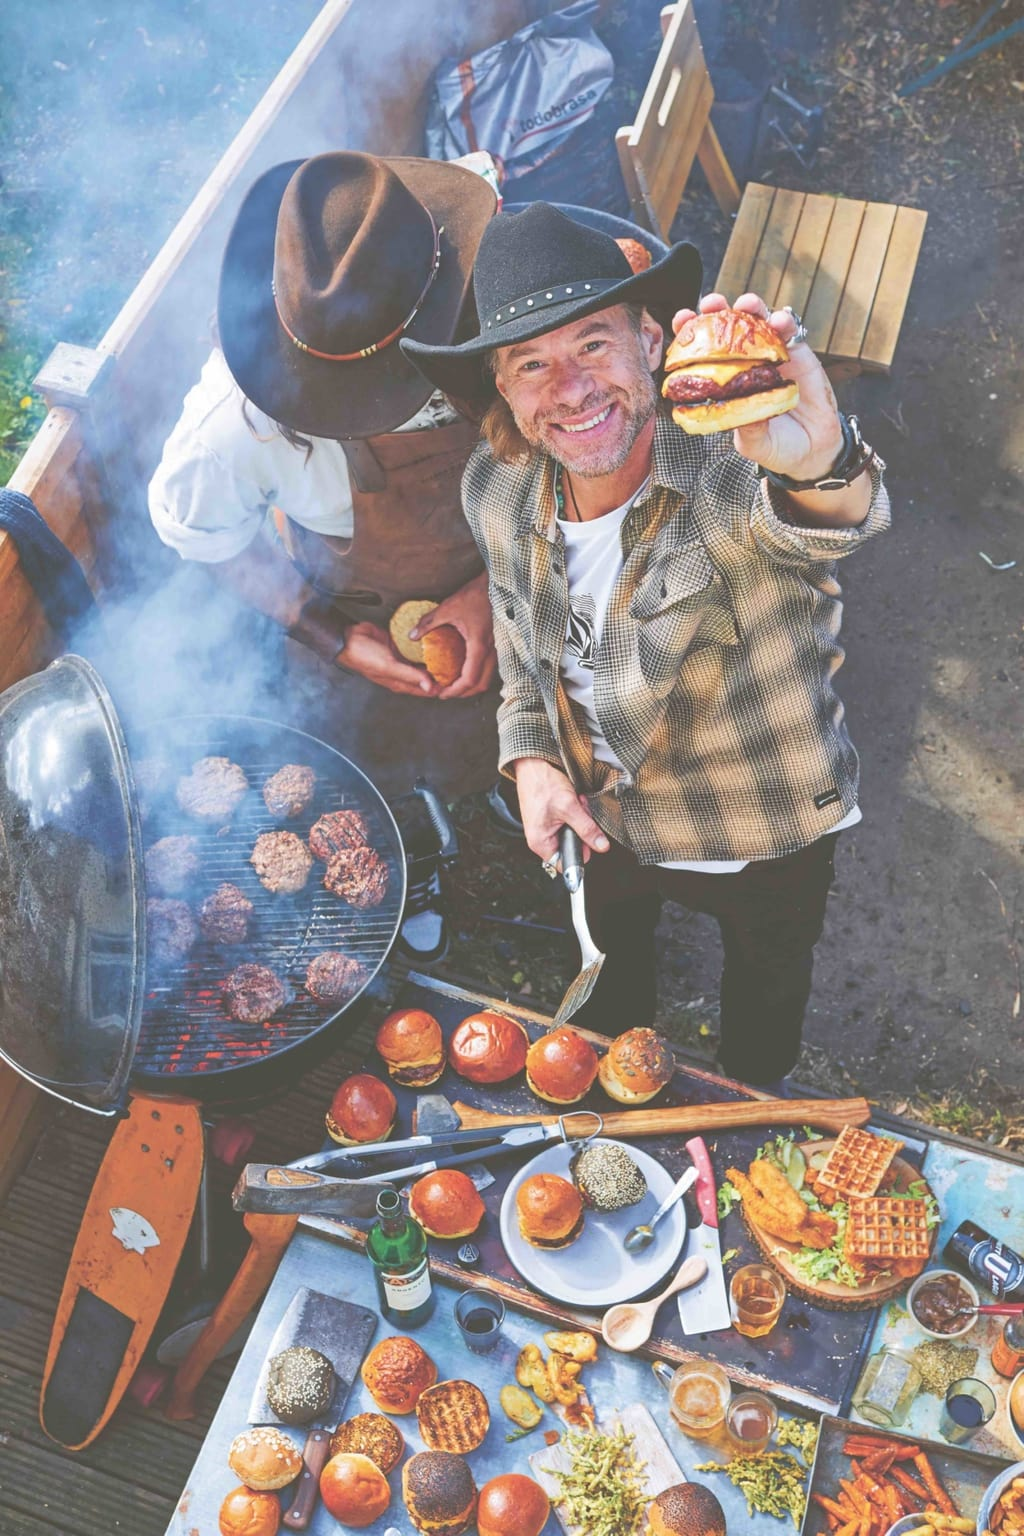 Christian Stevenson aka DJ BBQ holds up a burger to camera while BBQing